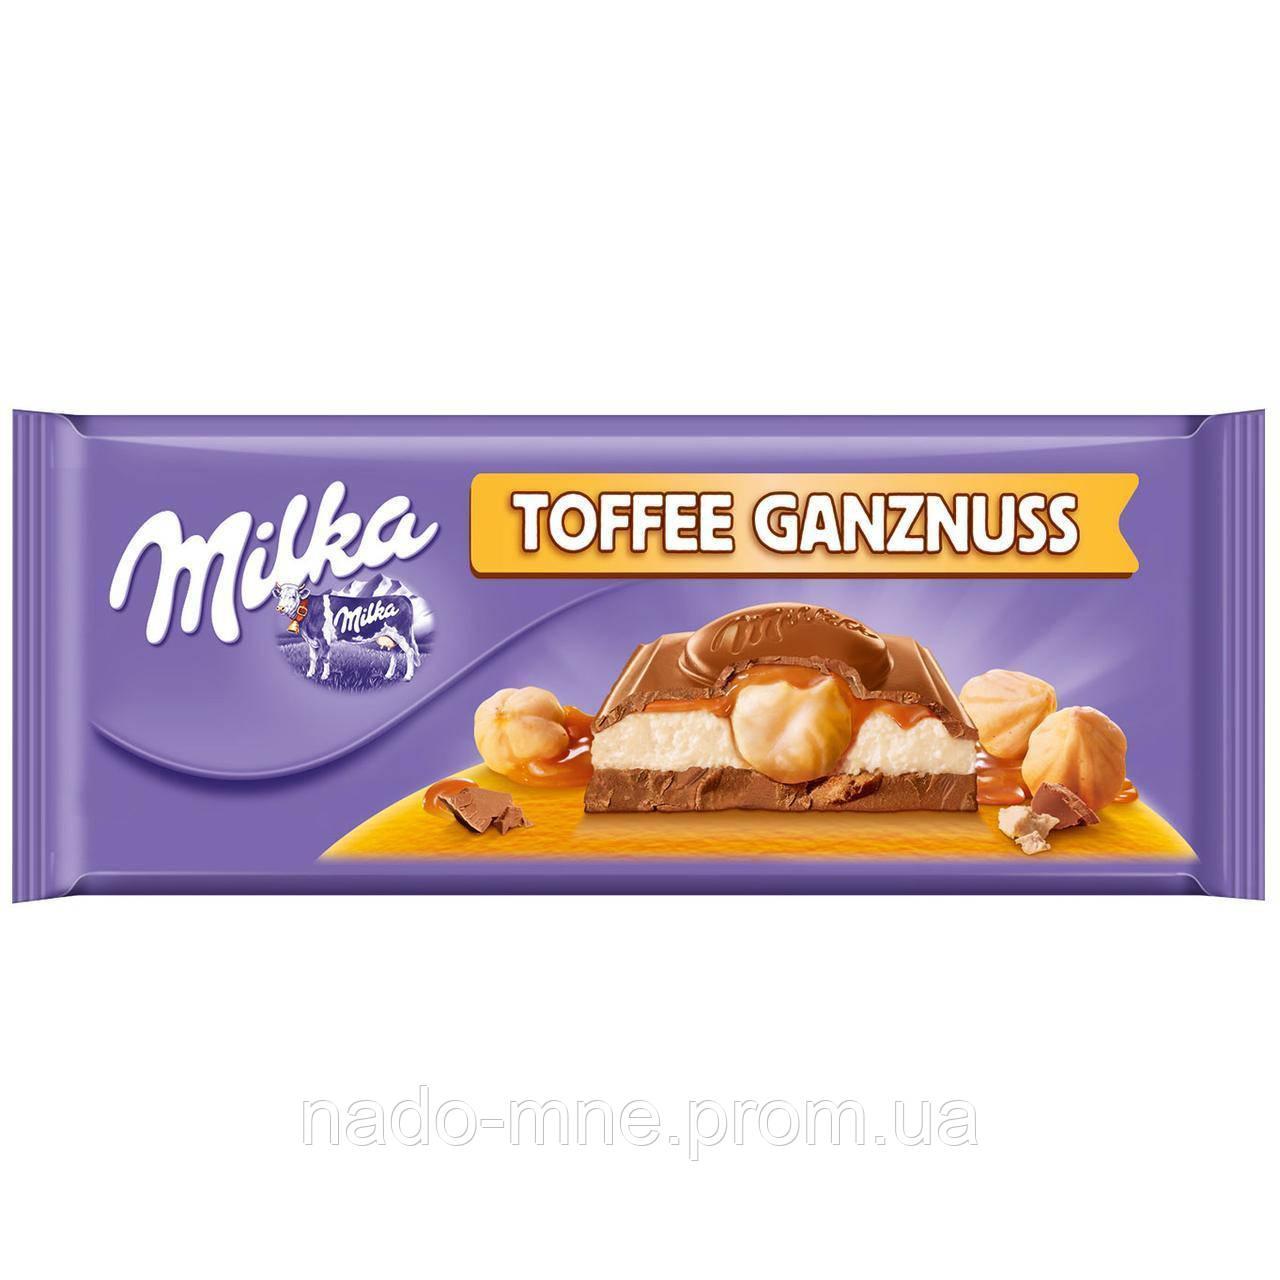 Шоколад Milka Toffee 300 г. Швейцария